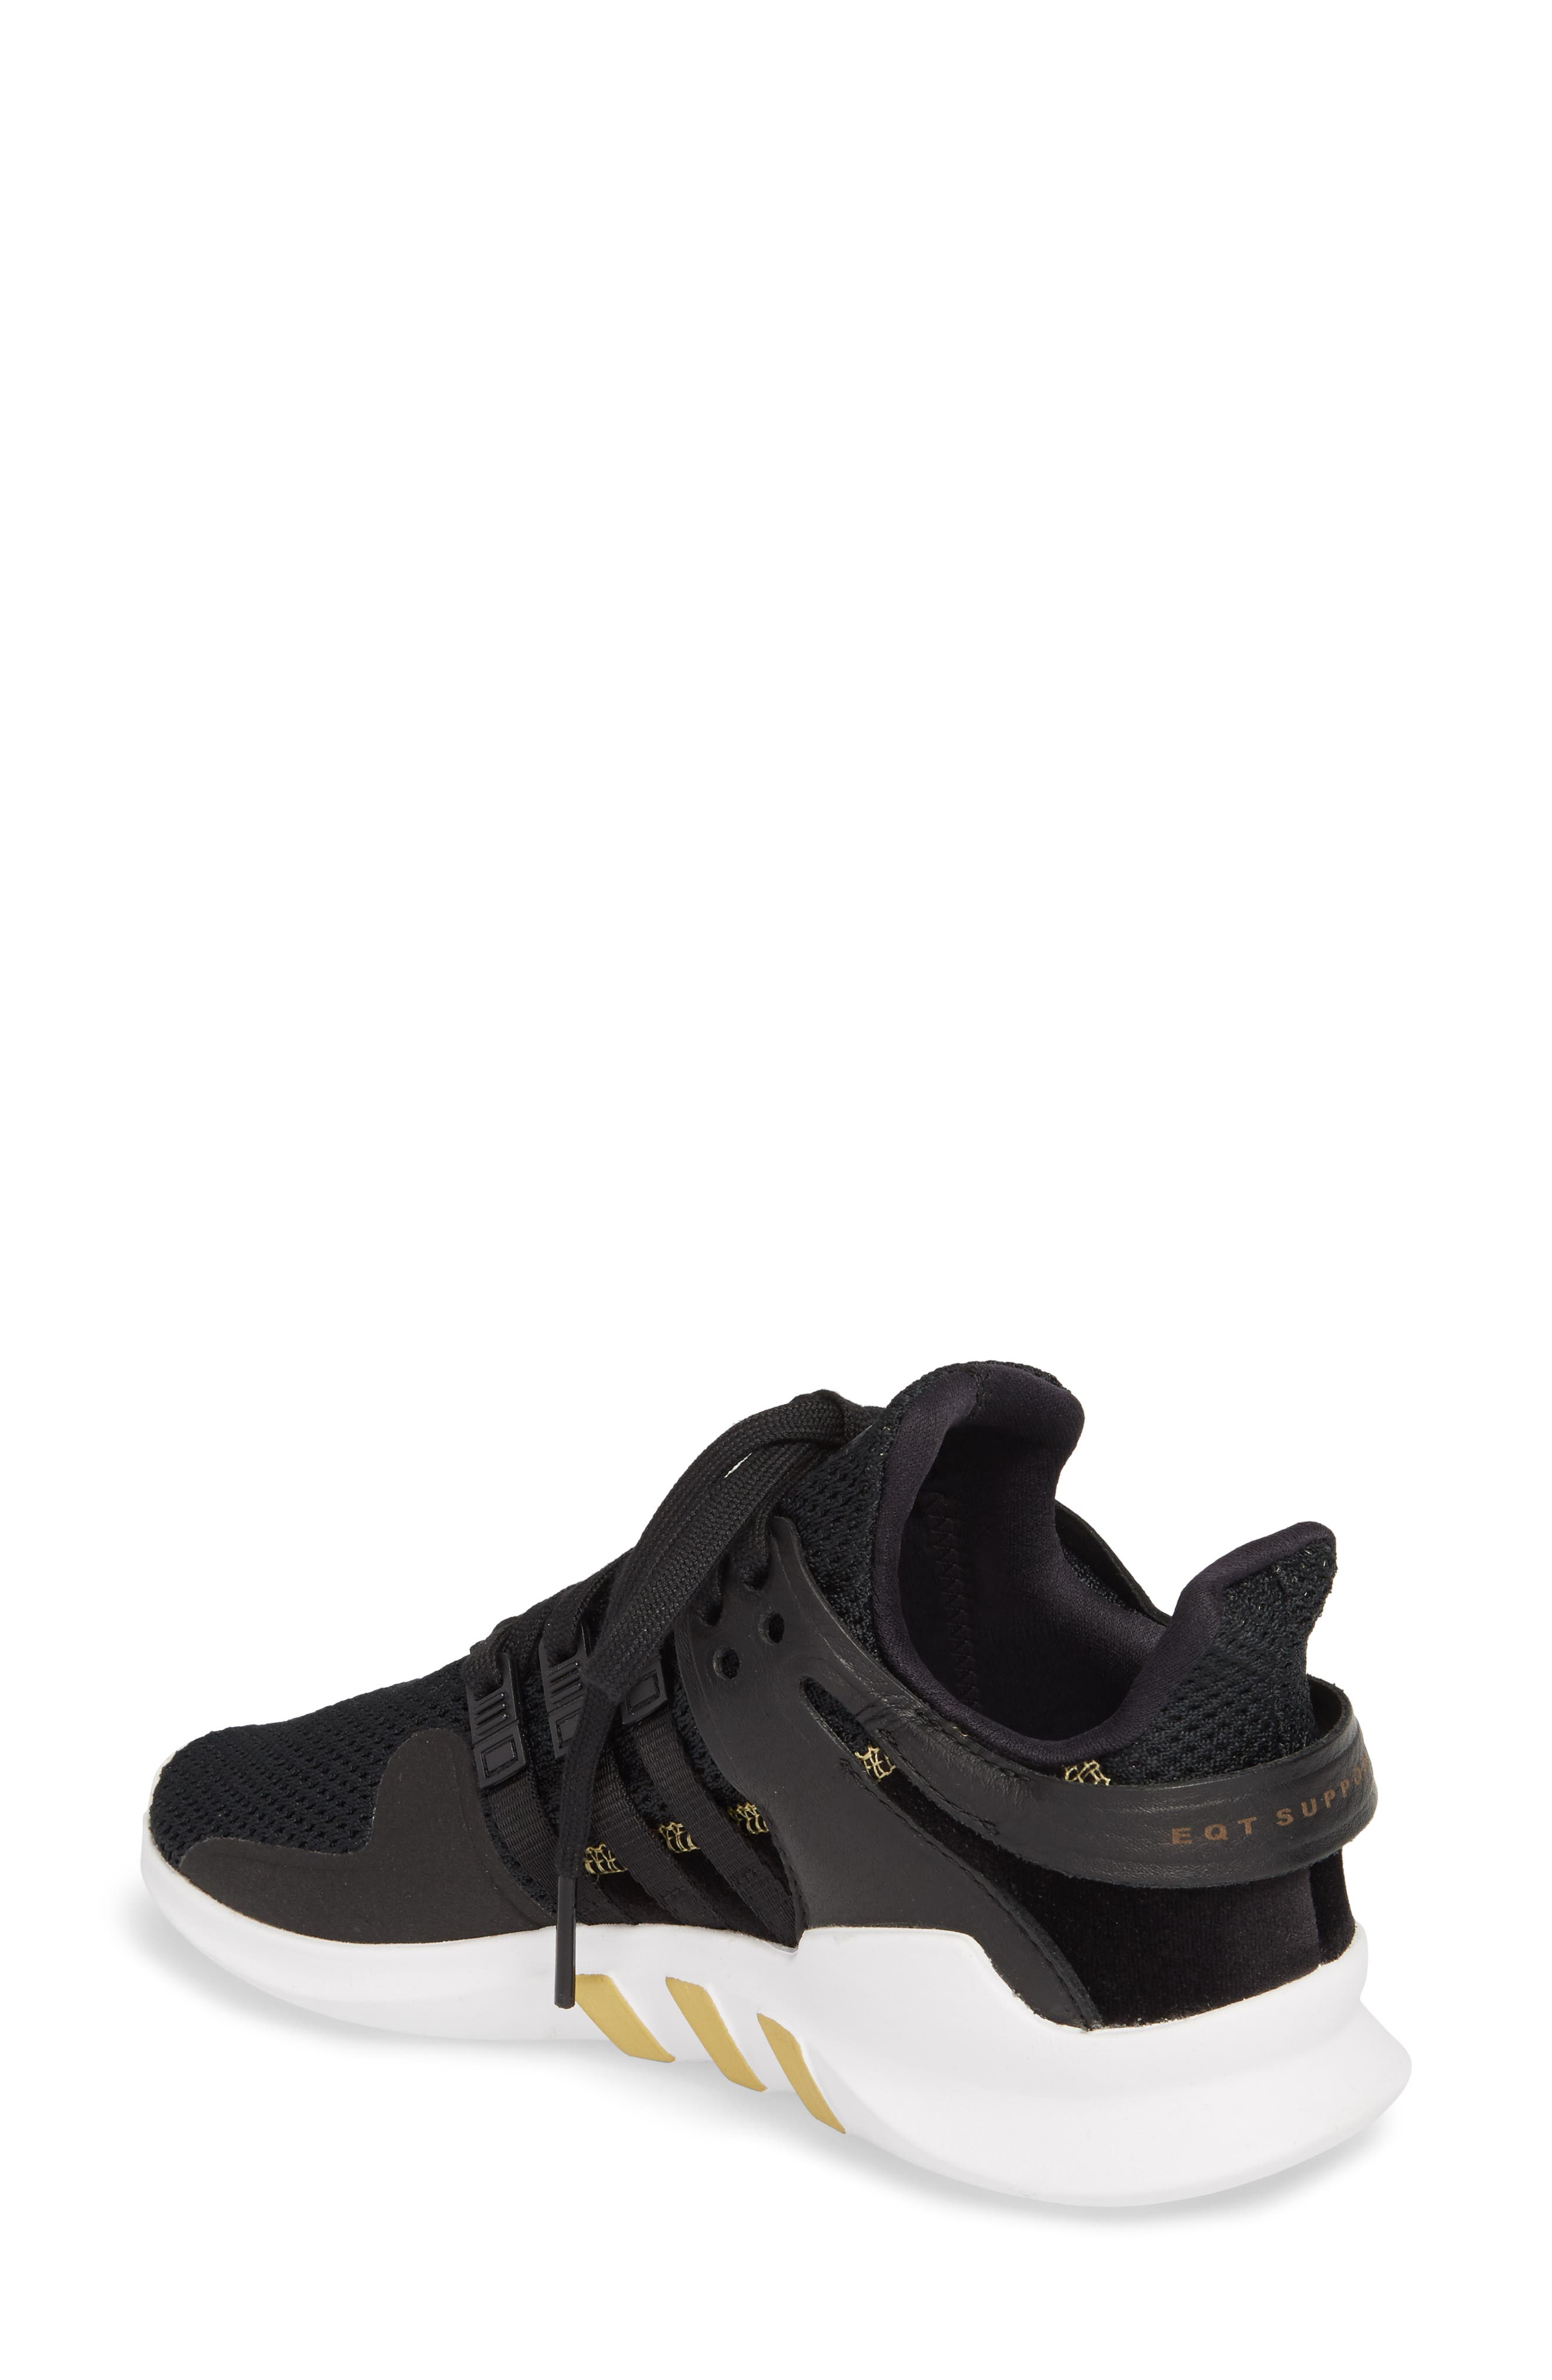 EQT Support Adv Sneaker,                             Alternate thumbnail 2, color,                             006